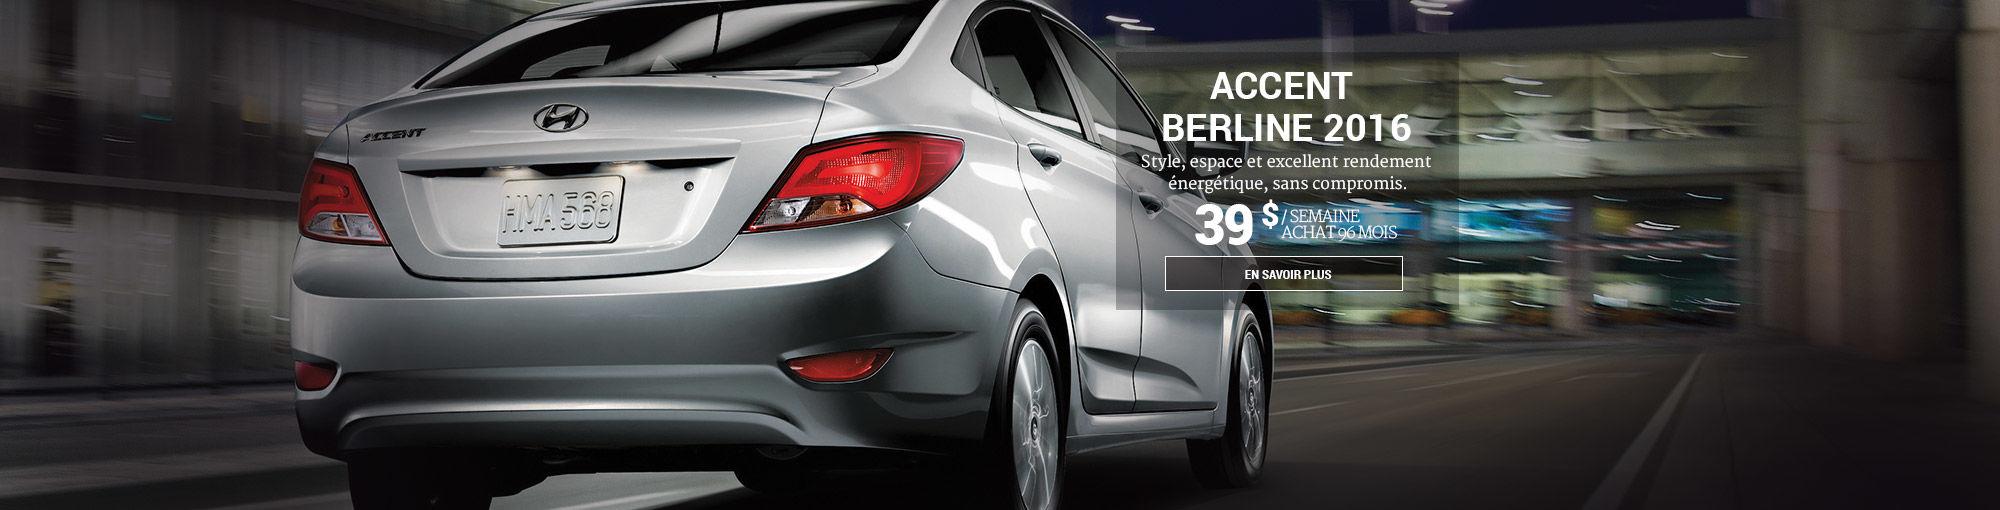 Hyundai Accent 2016 - header -février